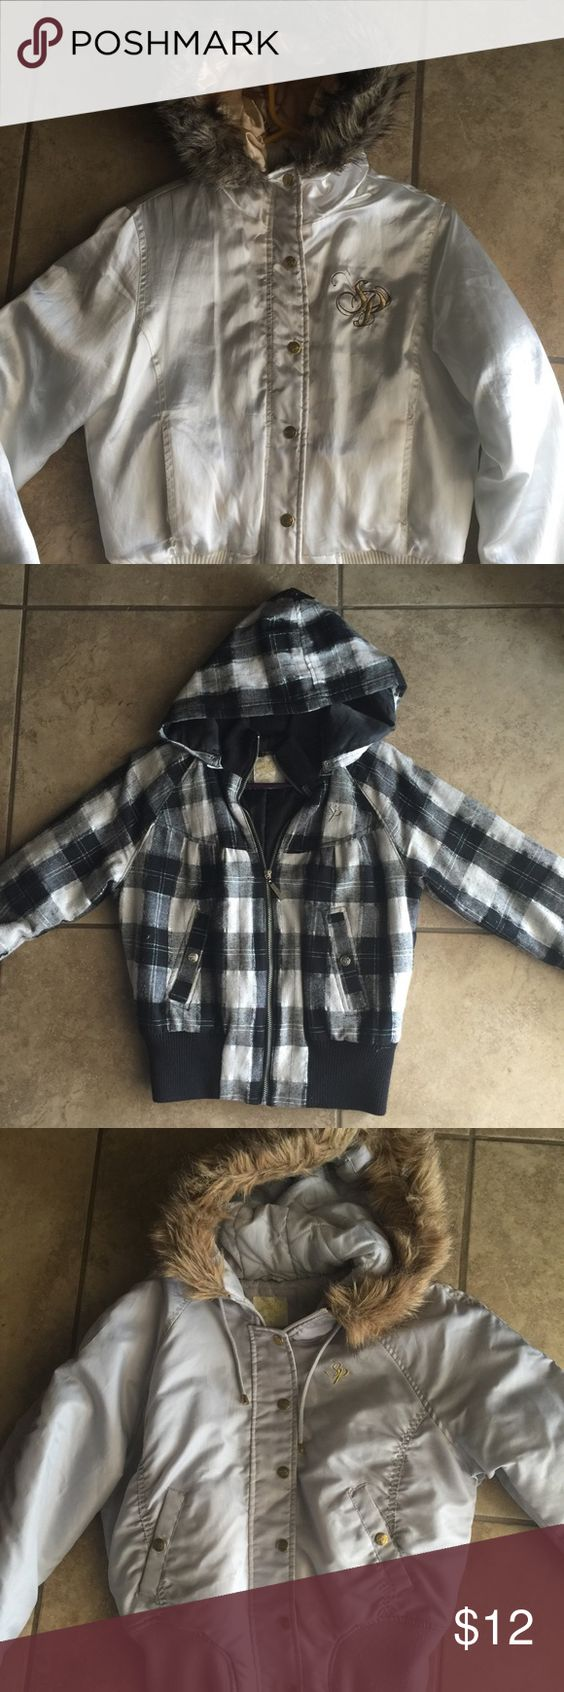 Various south pole jackets size medium great con Size medium Jackets & Coats Puffers